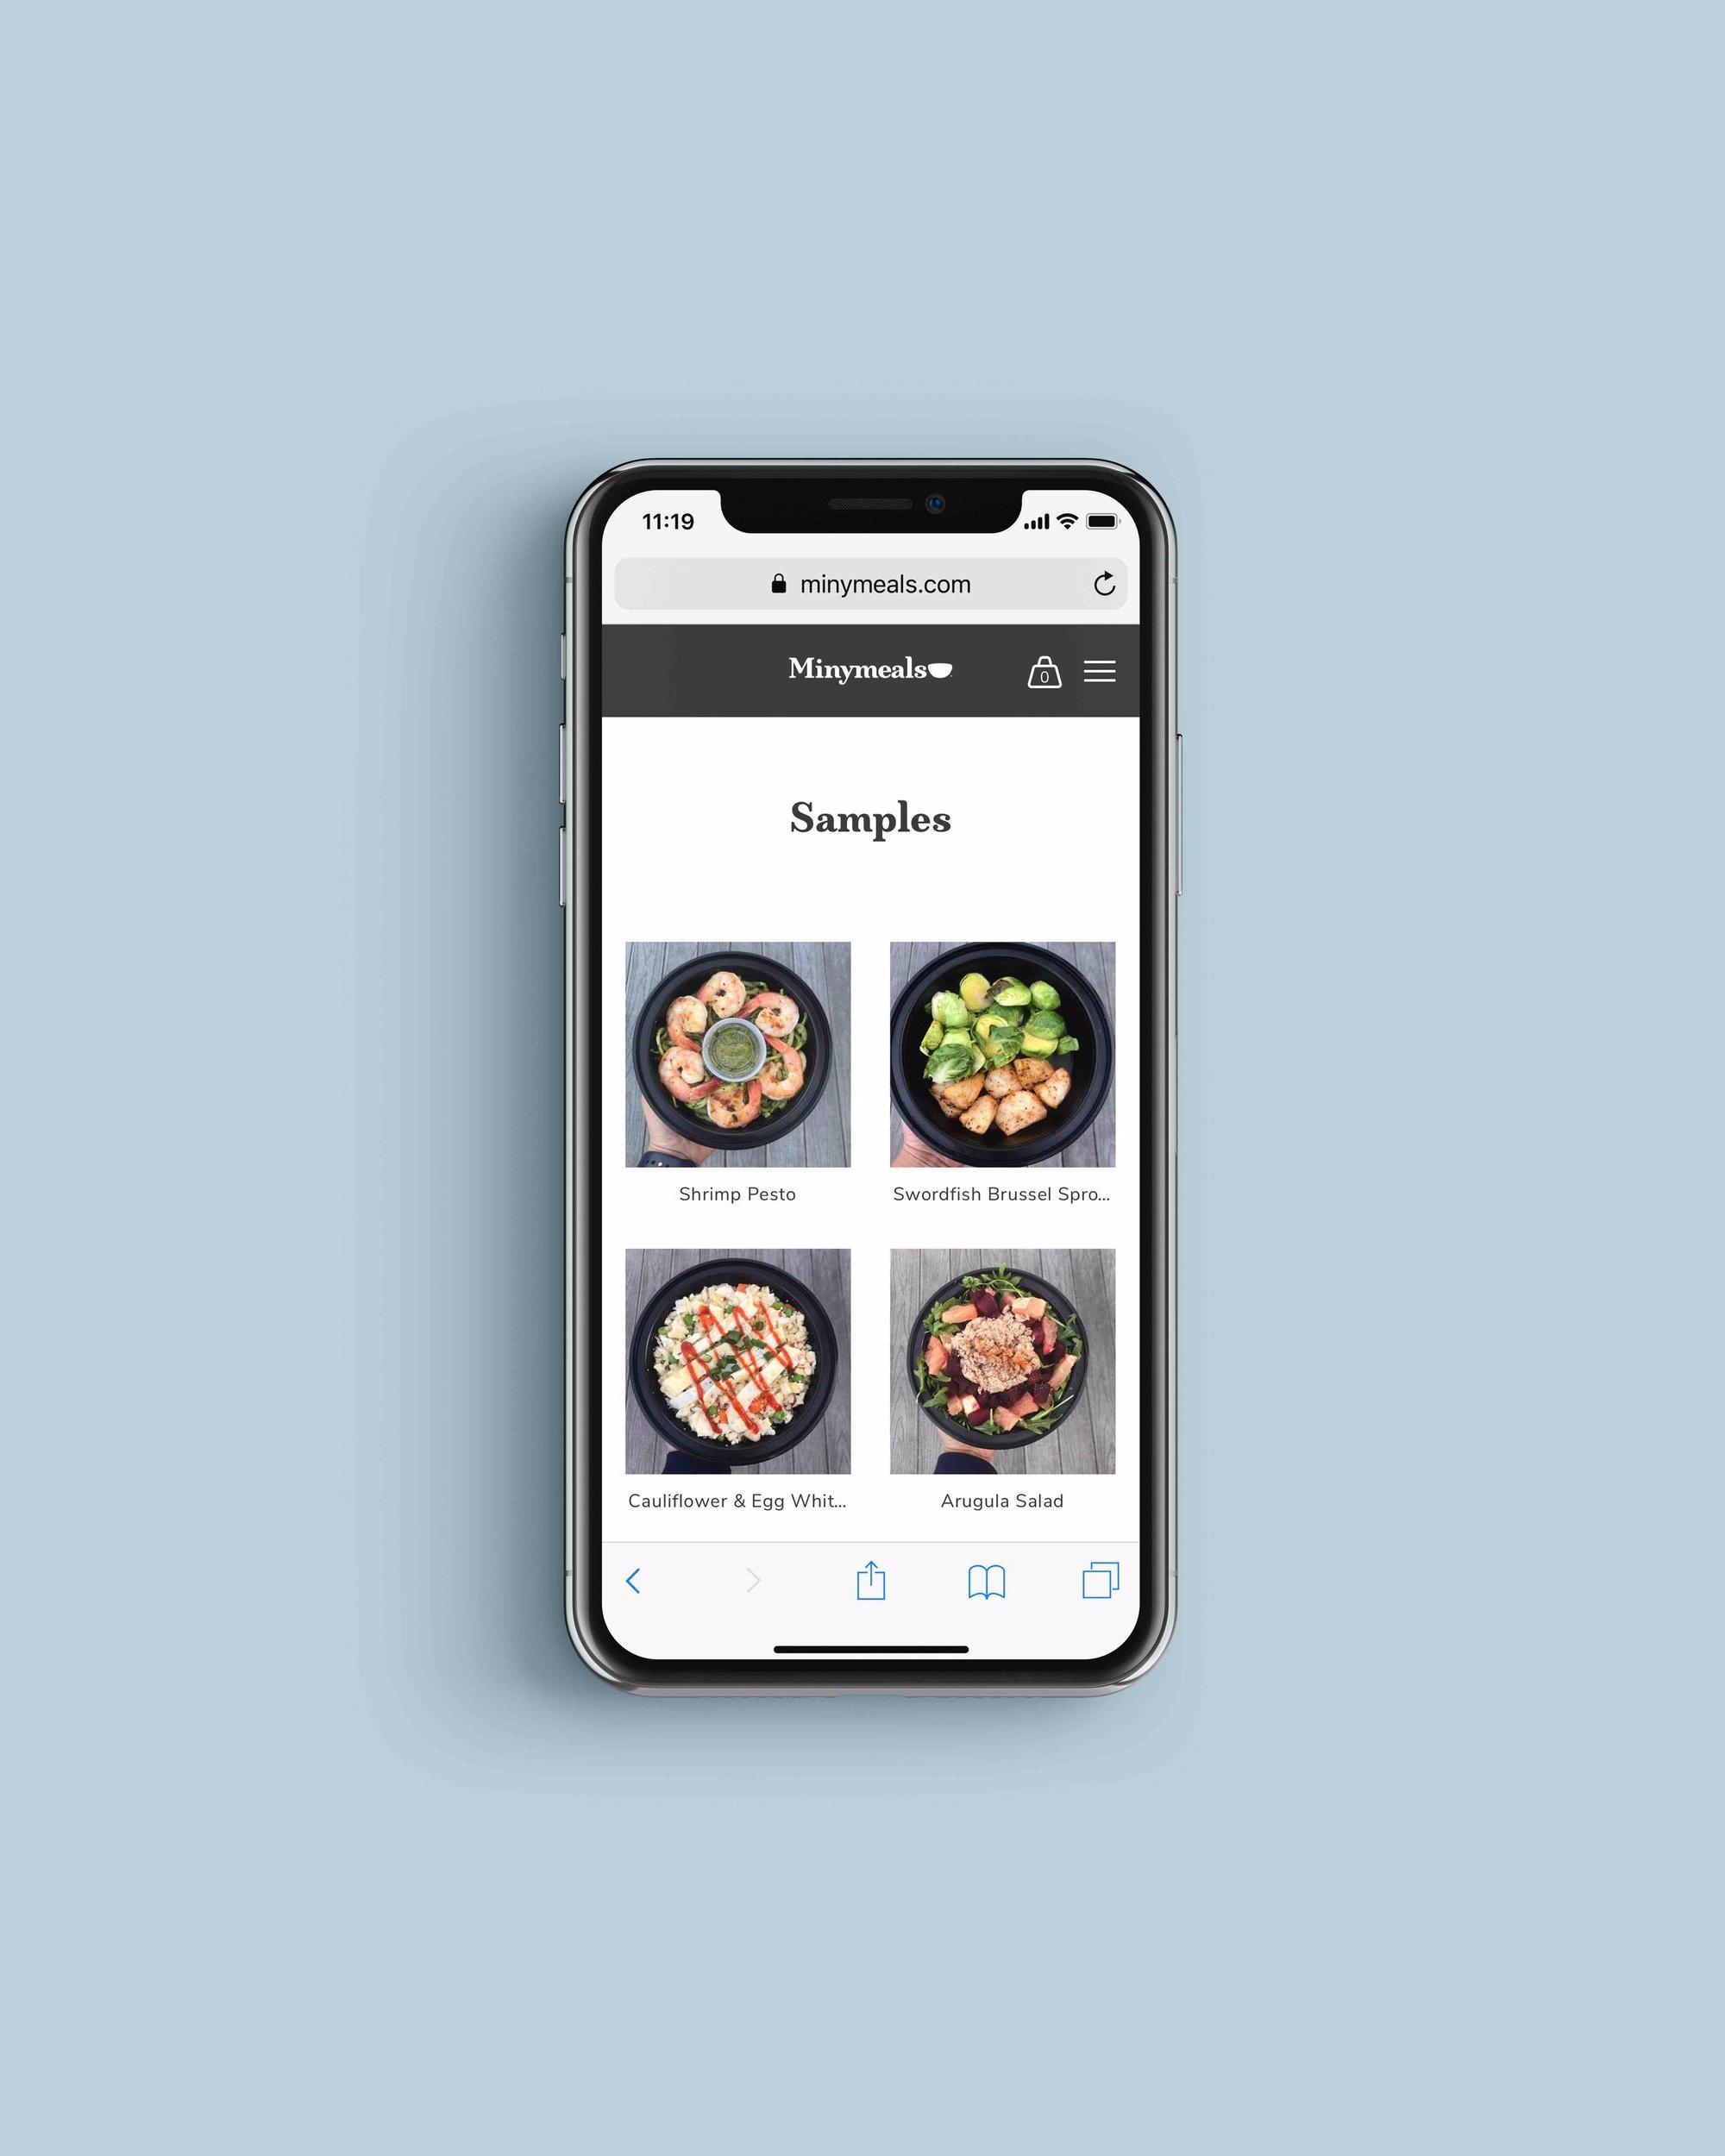 Minymeals website on iPhone X